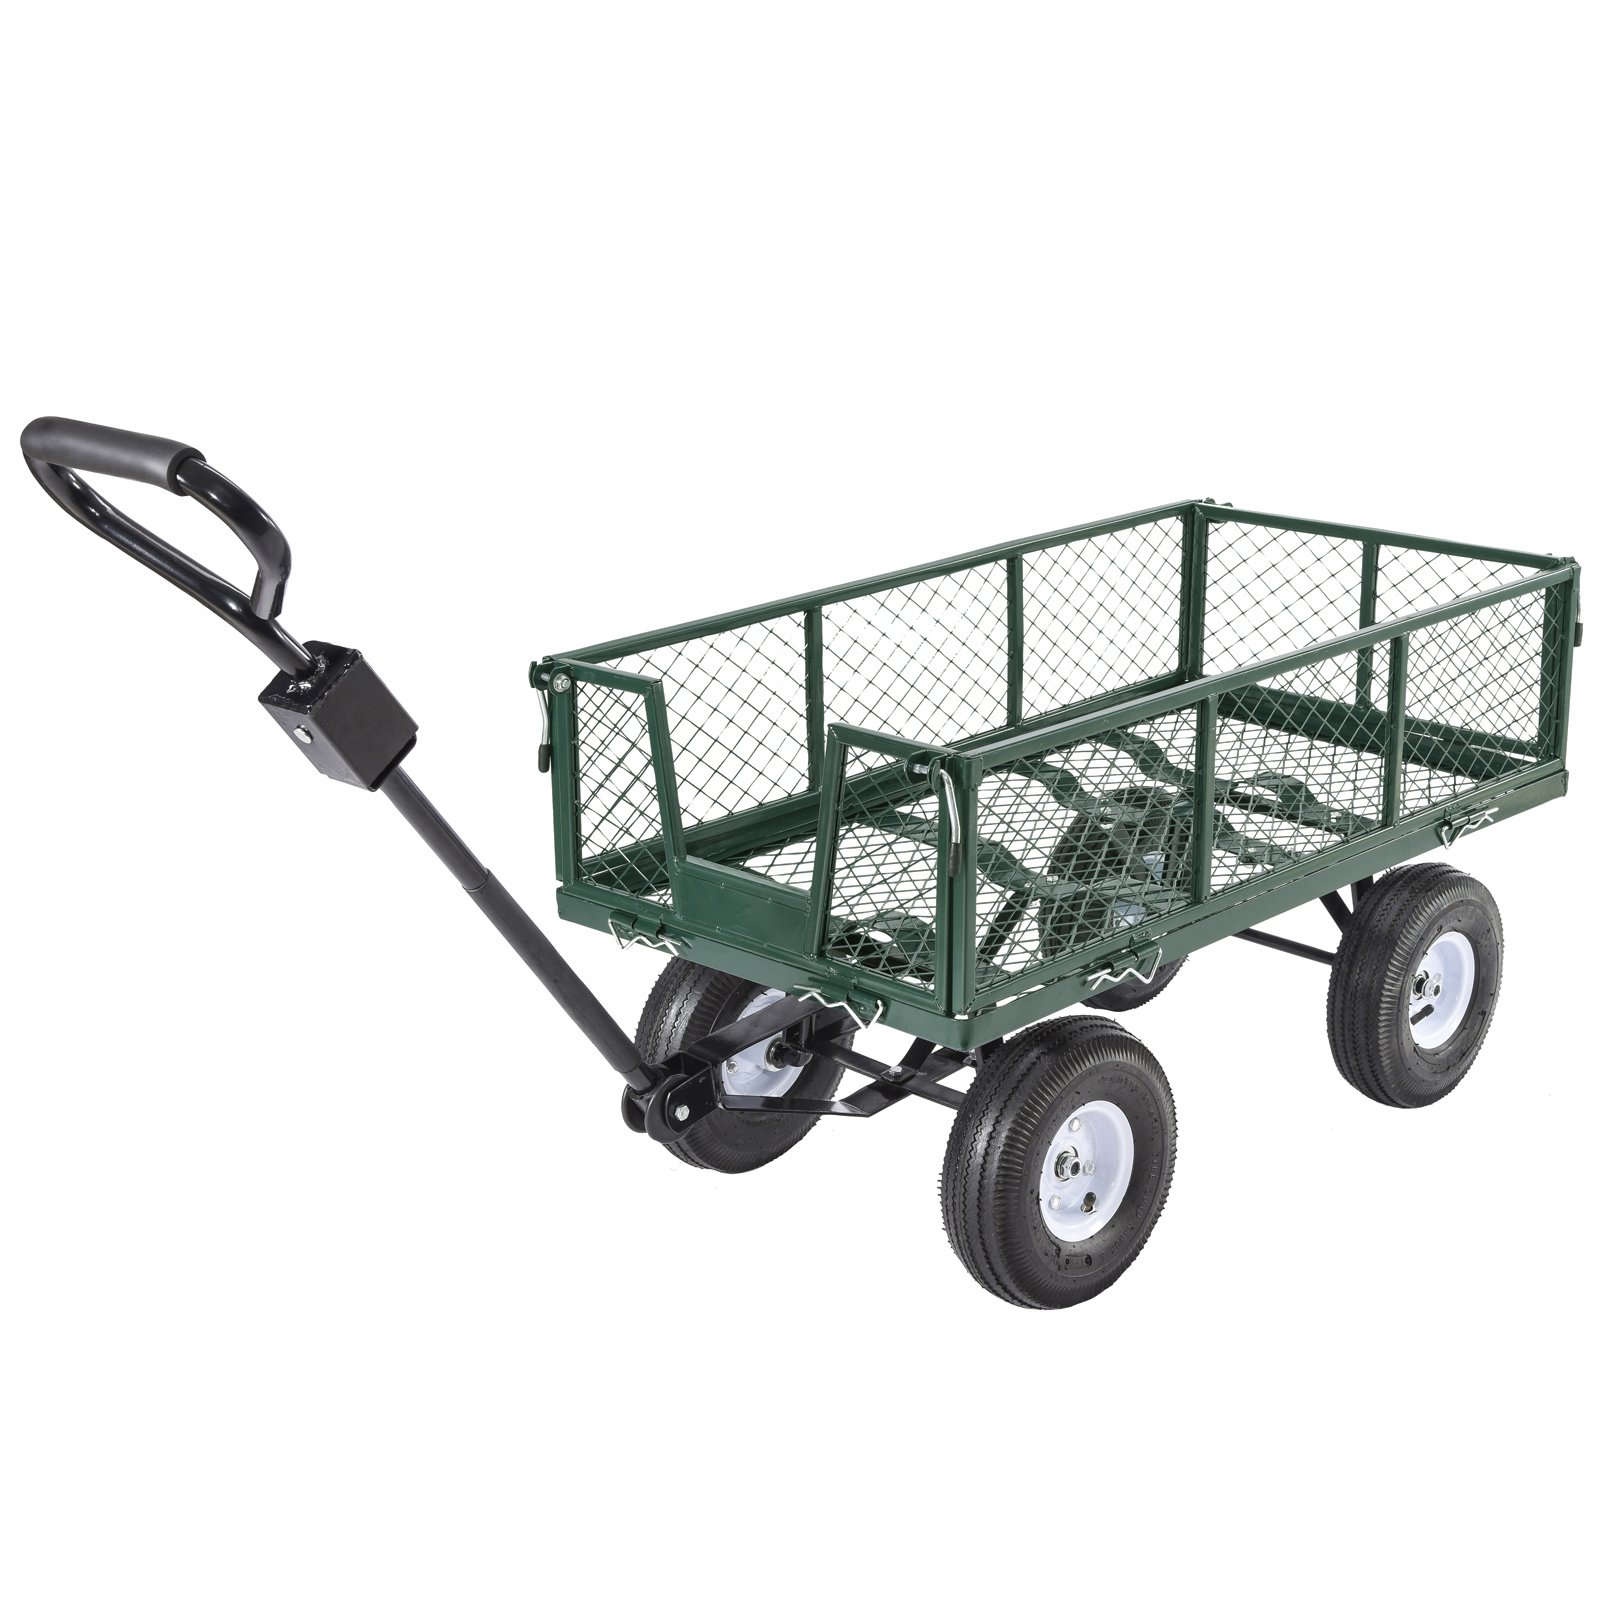 Uenjoy Garden Cart Multifunctional Folding Heavy Duty Wagon Durable Steel Cart, 660Ibs Green